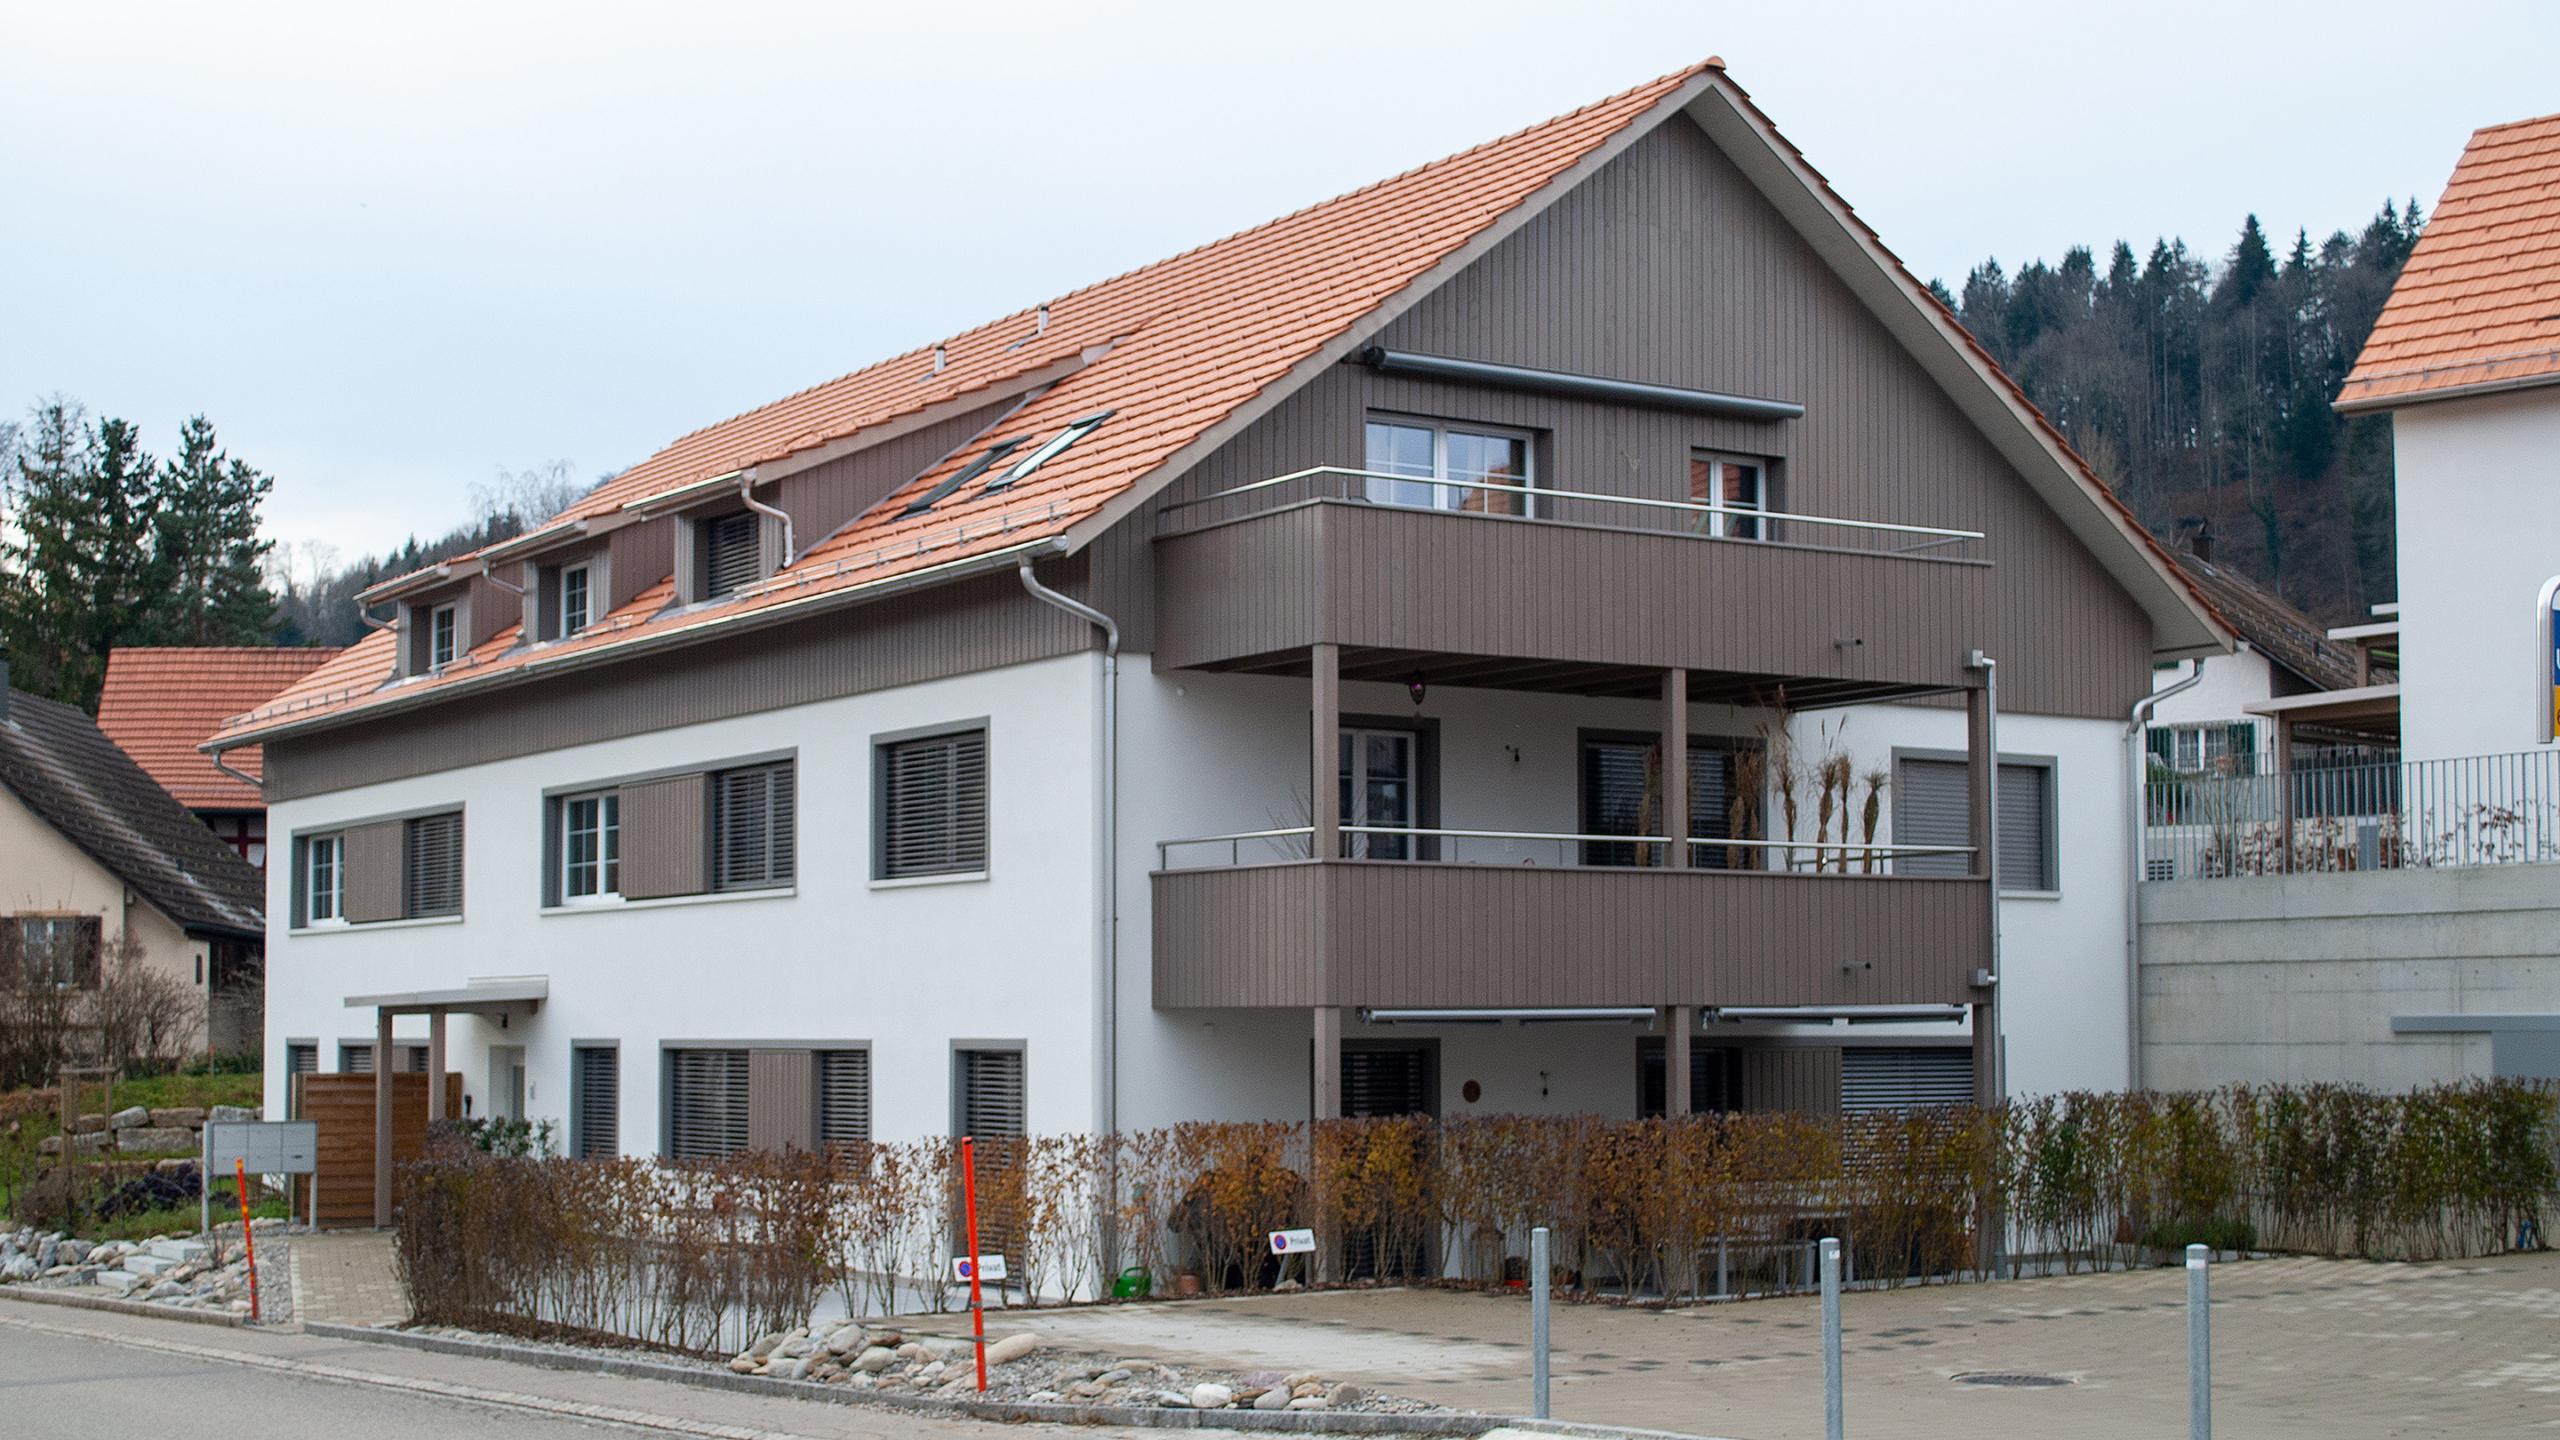 Projekt Schauenbergblick in Schlatt, Haus A